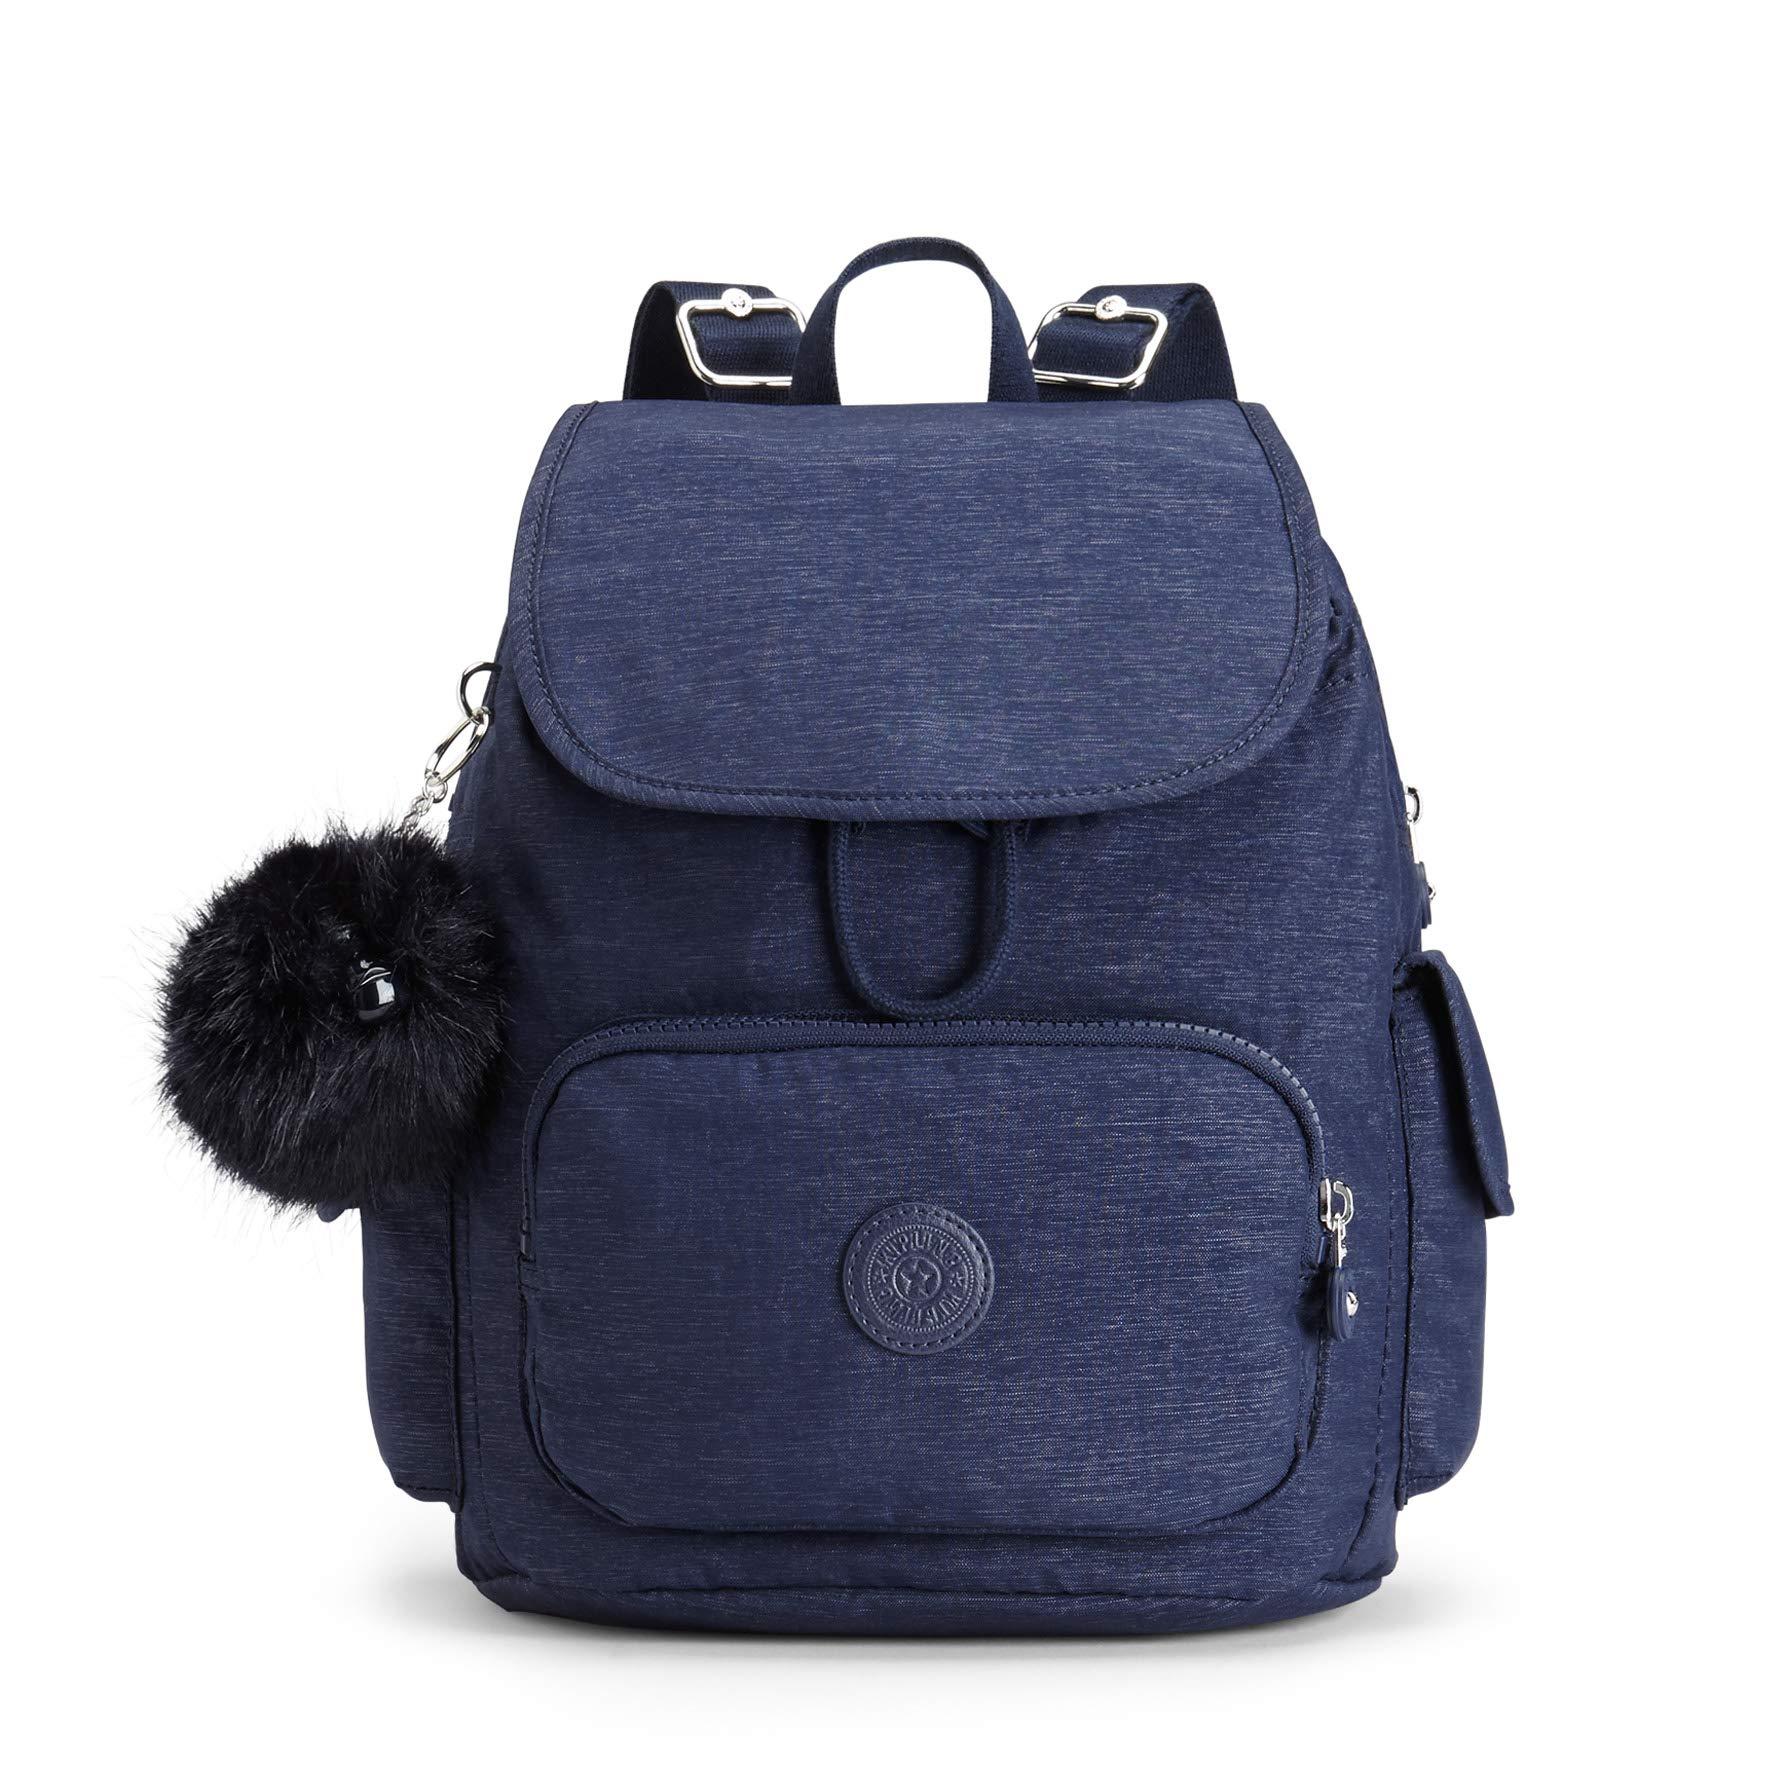 76b70b924c88 Best Rated in Women s Fashion Backpacks   Helpful Customer Reviews ...